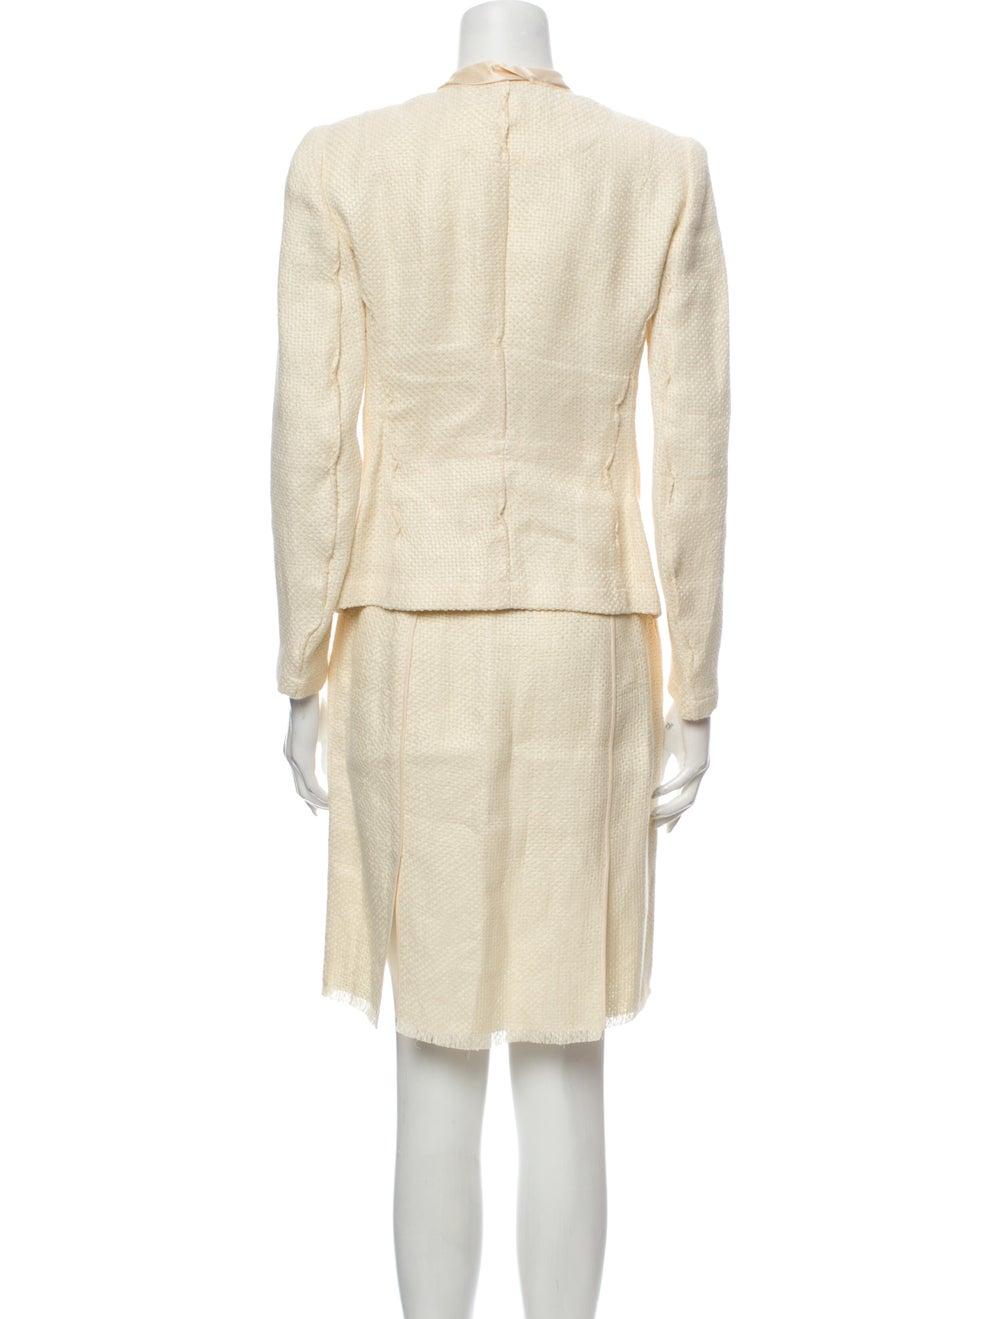 Donna Karan Linen Skirt Suit - image 3